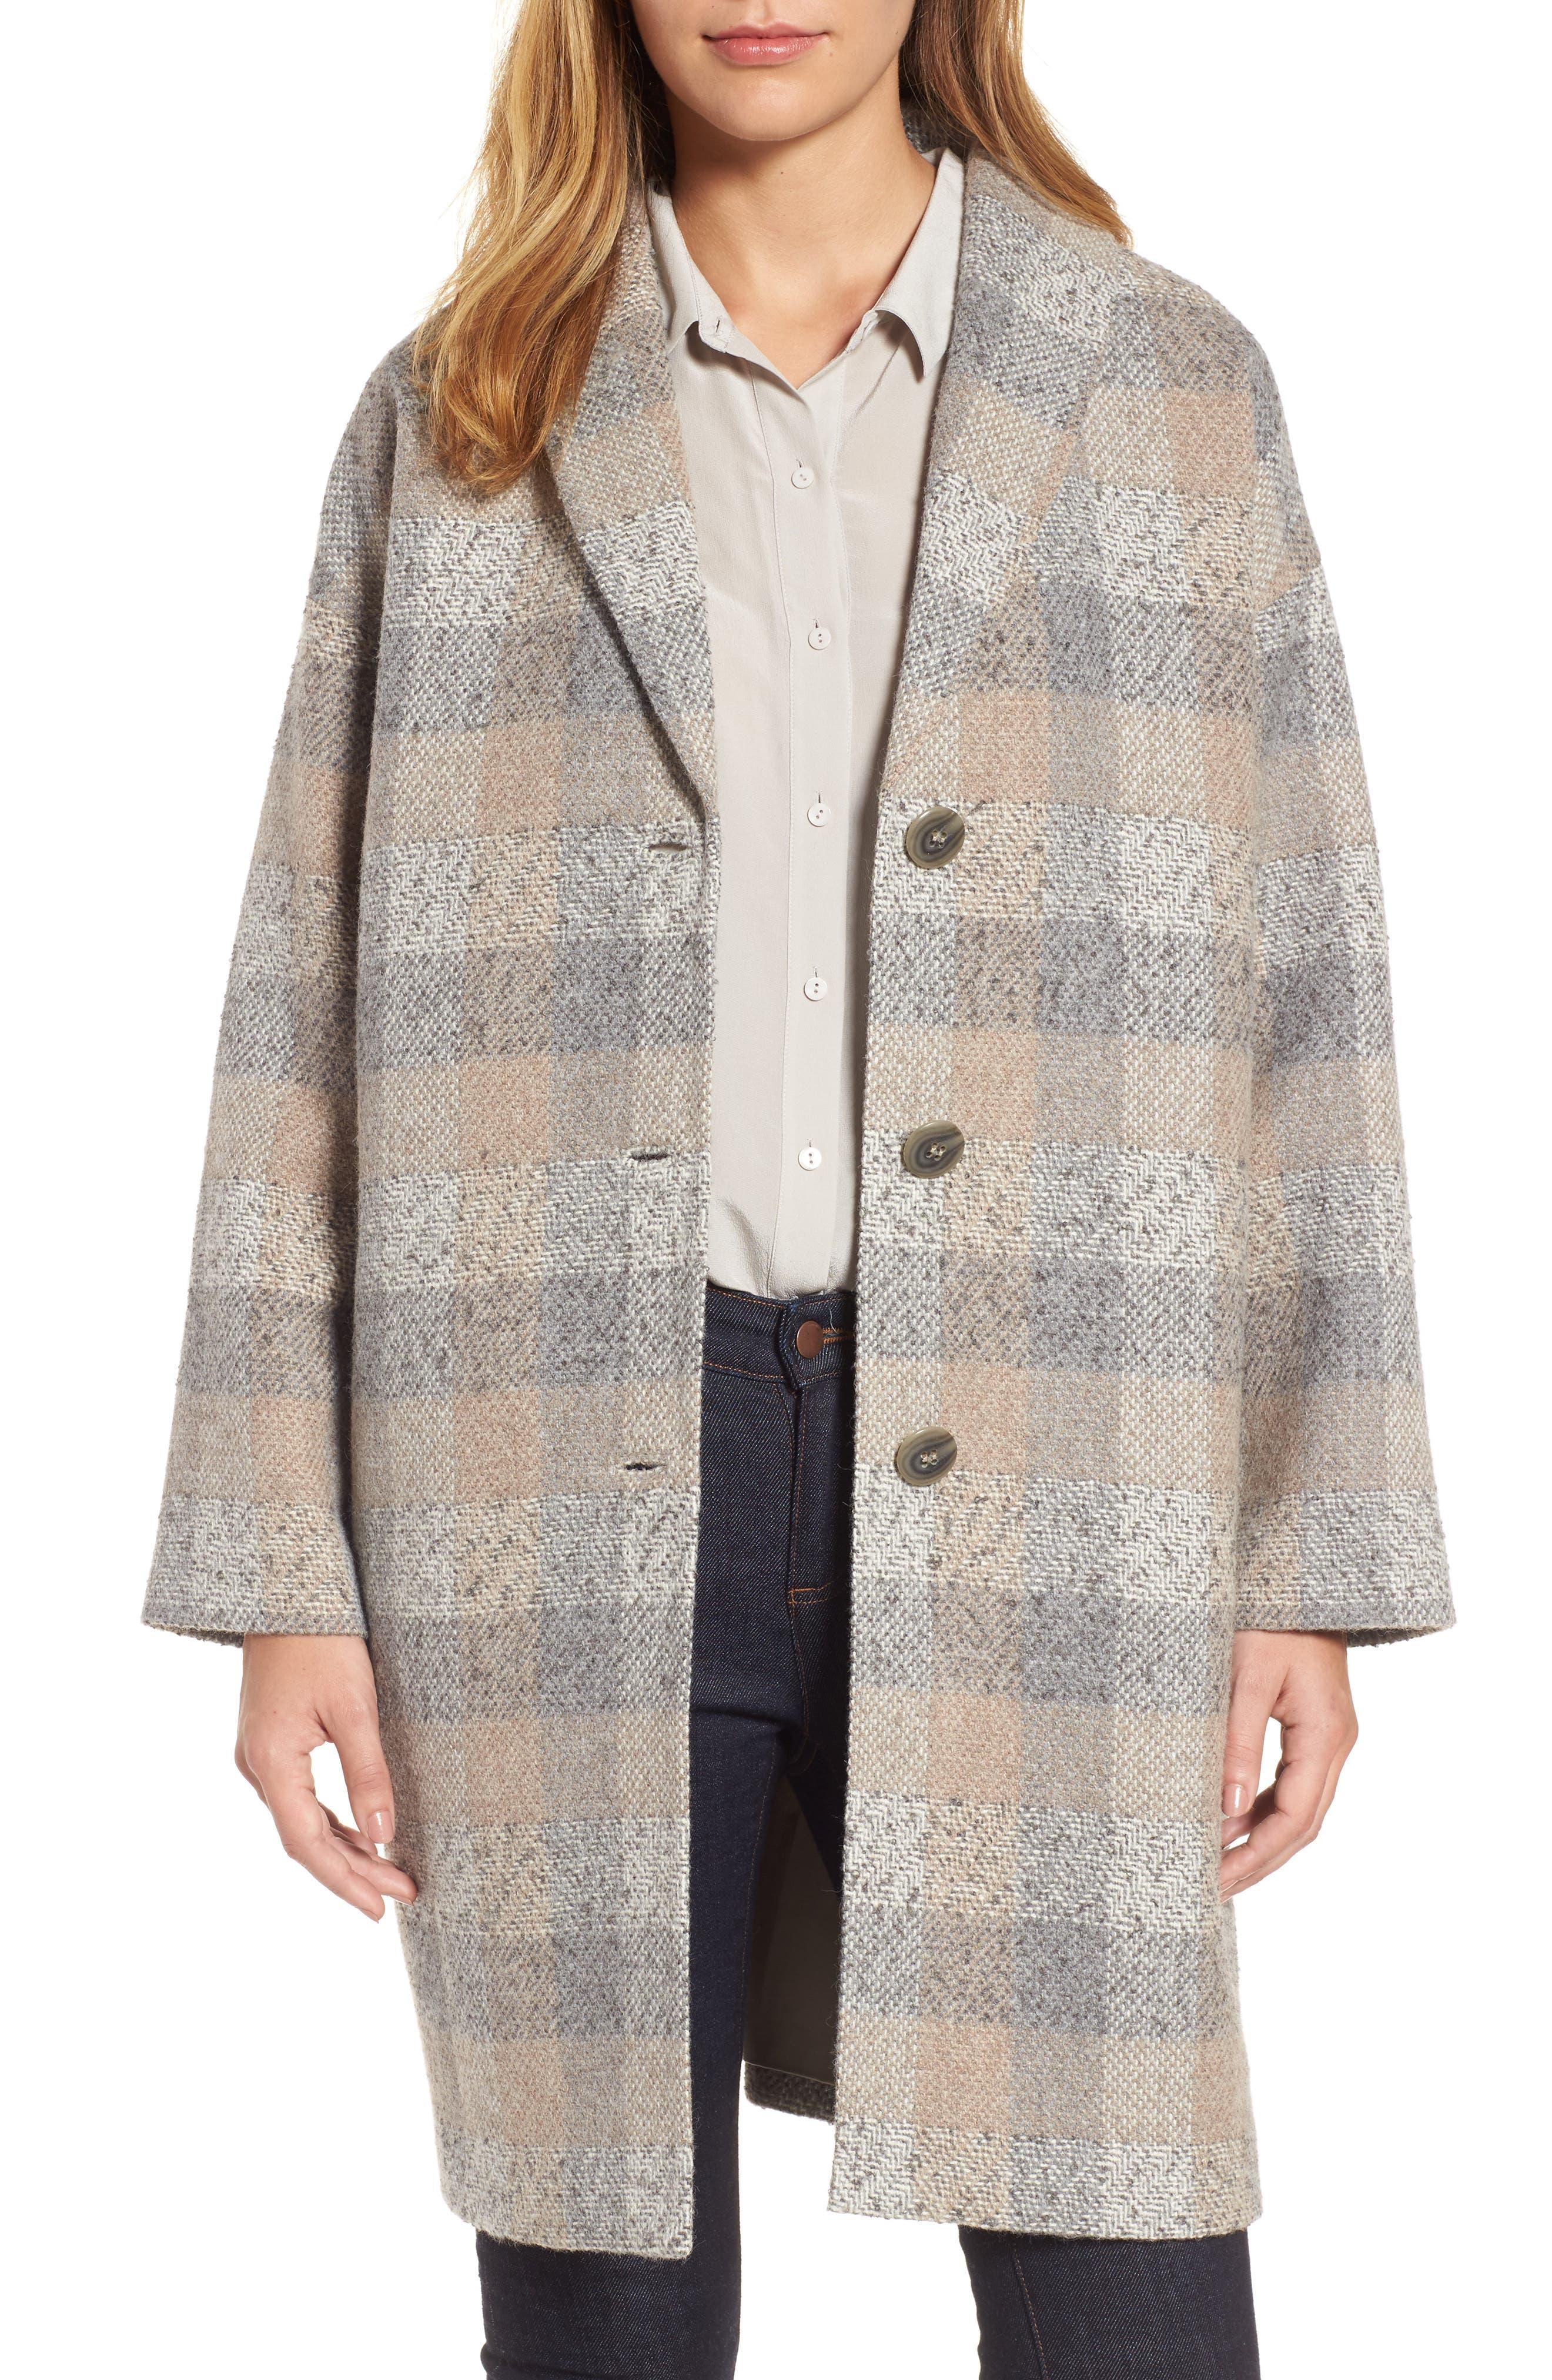 Alternate Image 1 Selected - Eileen Fisher Plaid Alpaca Blend Coat